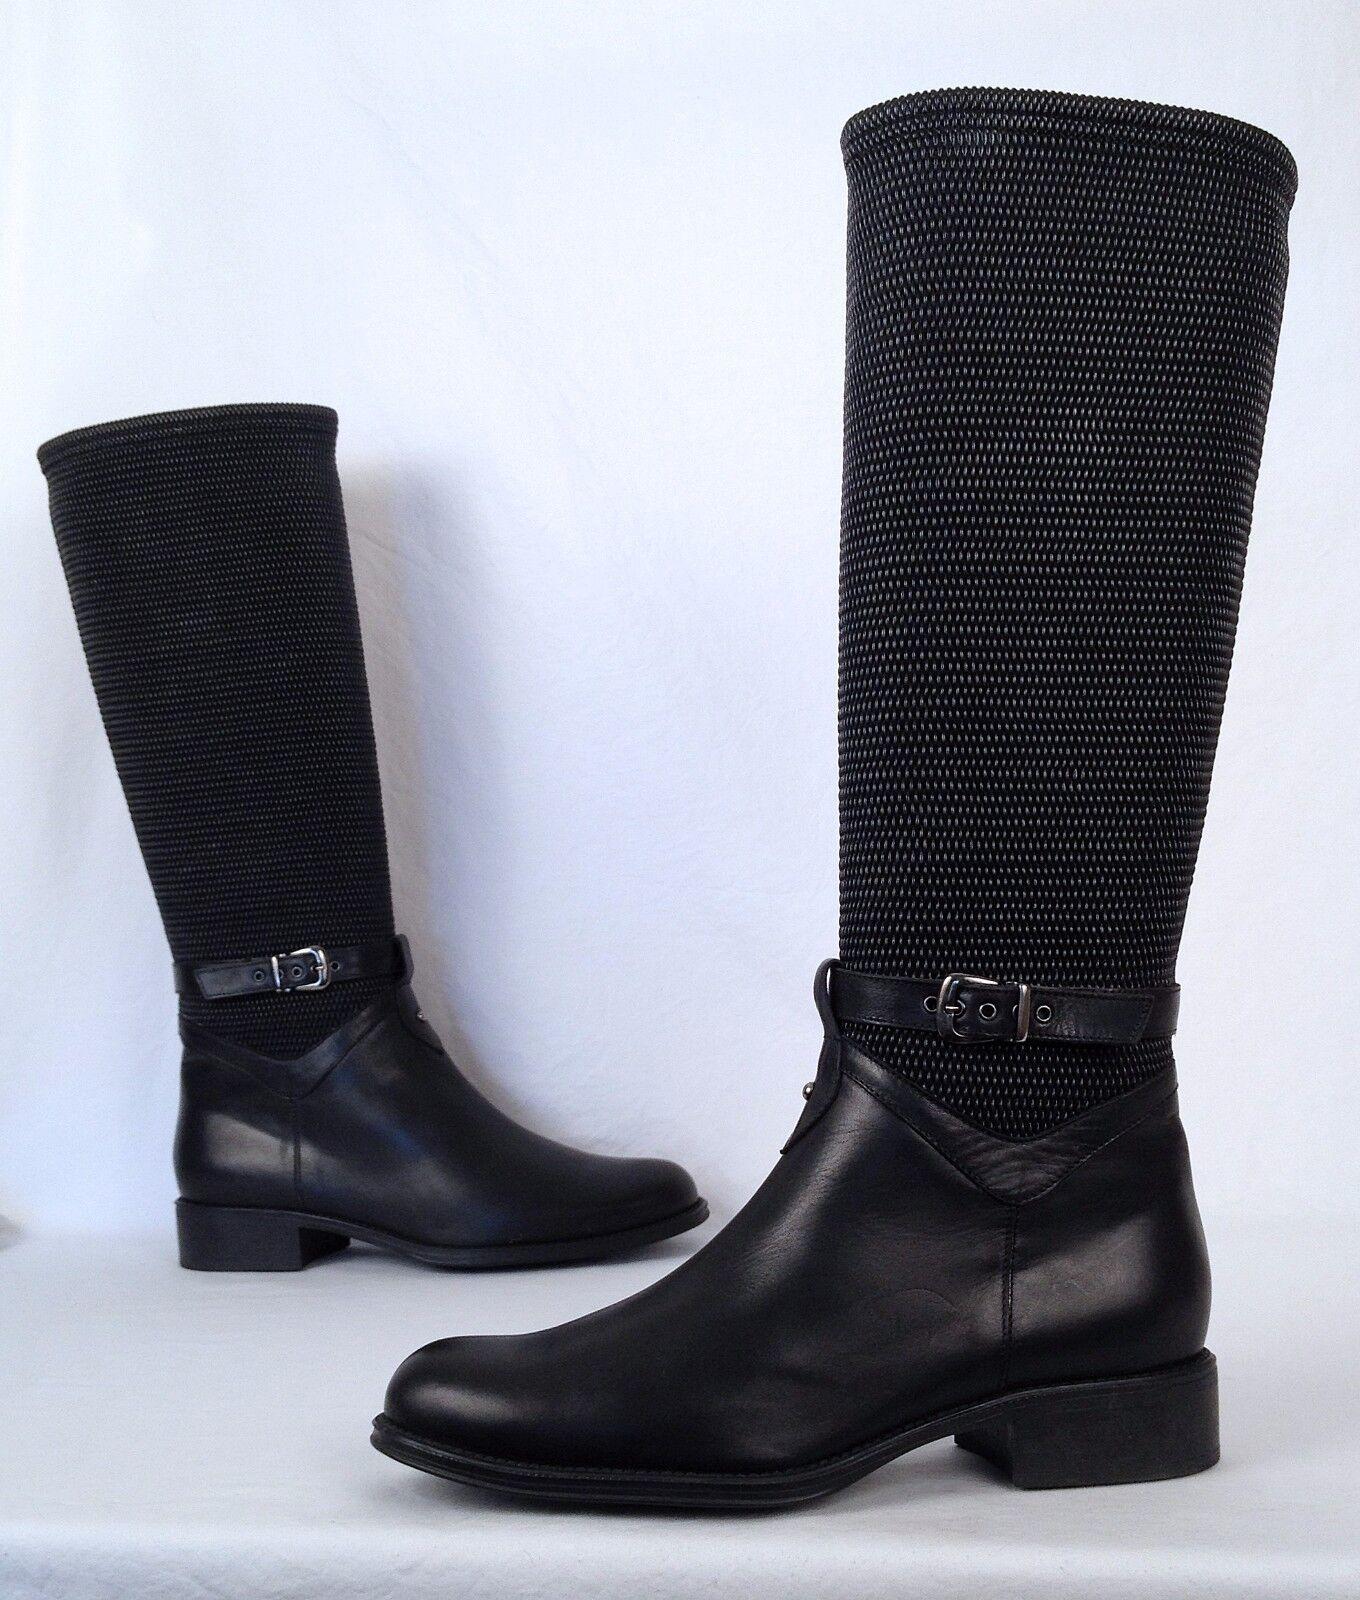 Aquatalia by Marvin K 'Undy' Boot- Black- Size 10 US-  598  (B14)